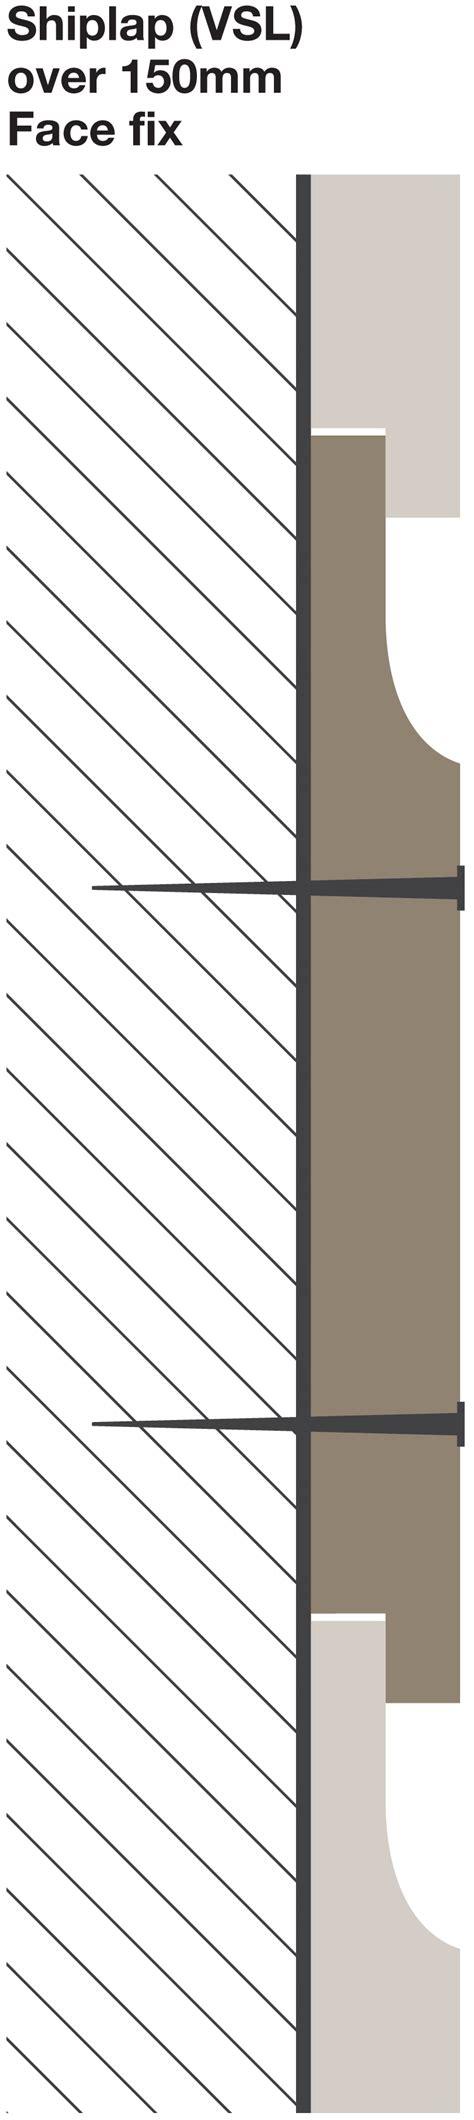 Fixing Shiplap Timber Cladding - shiplap vastern